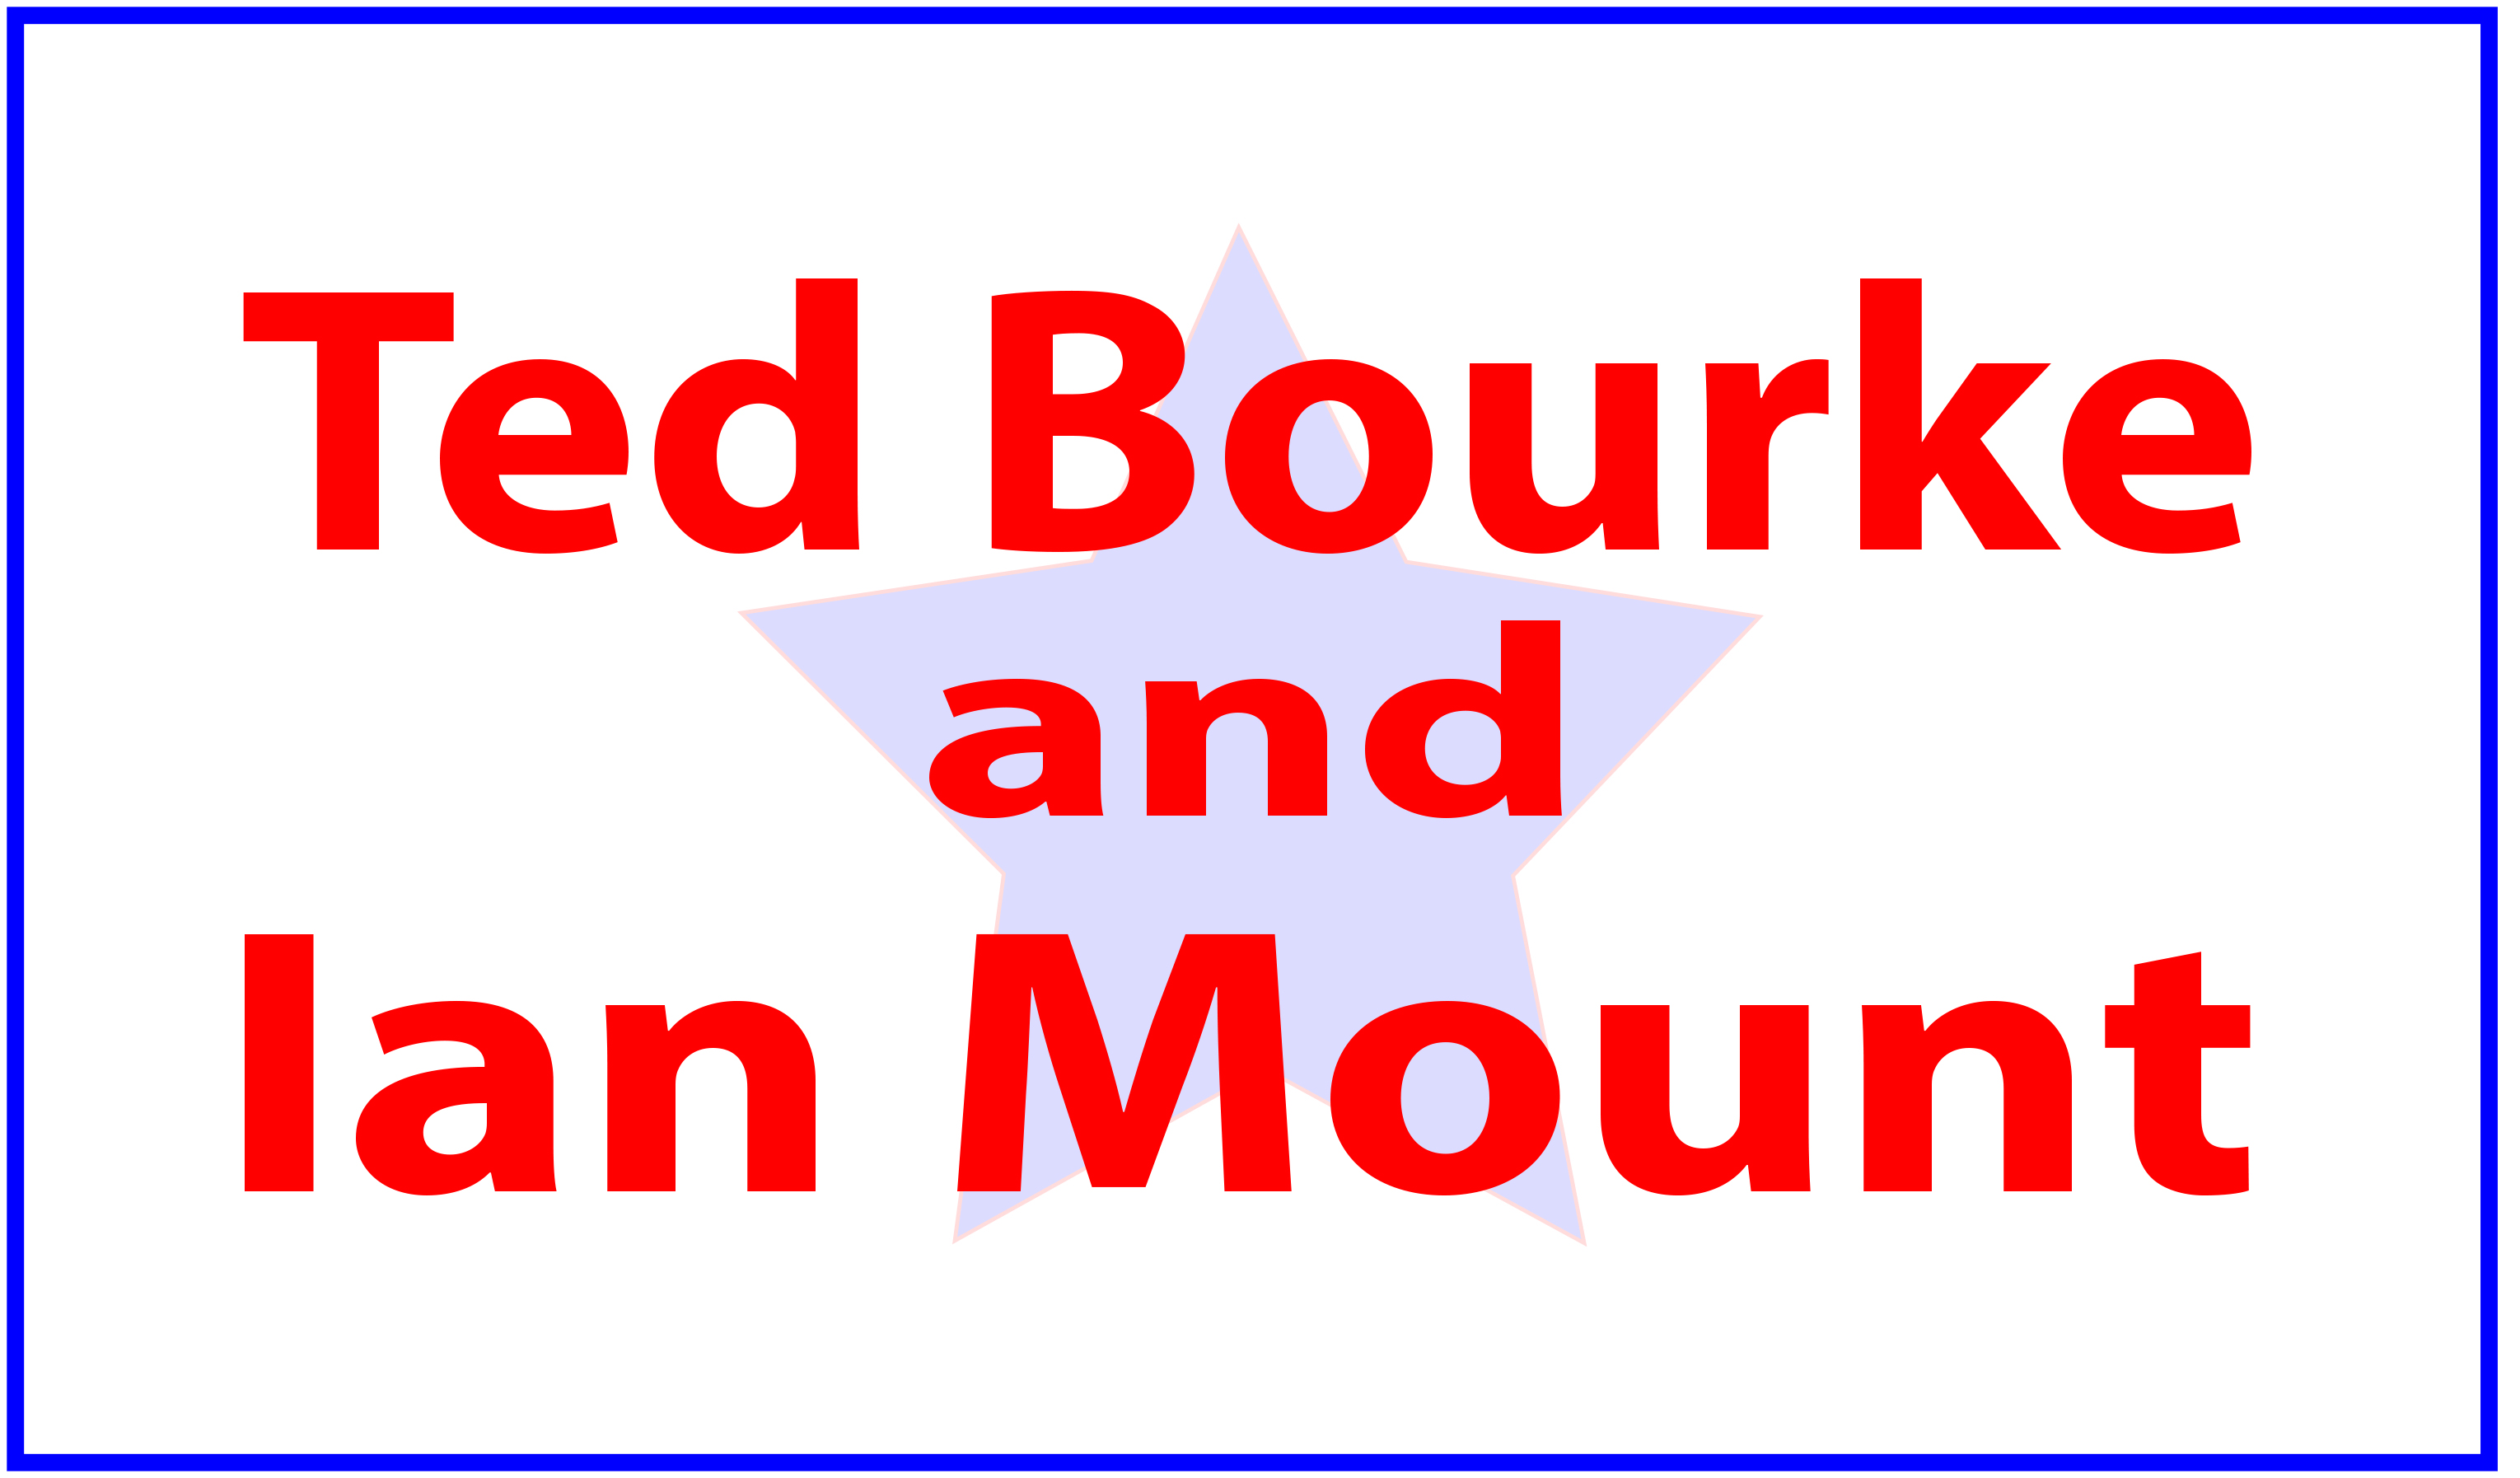 Ted Bourke and Ian Mount